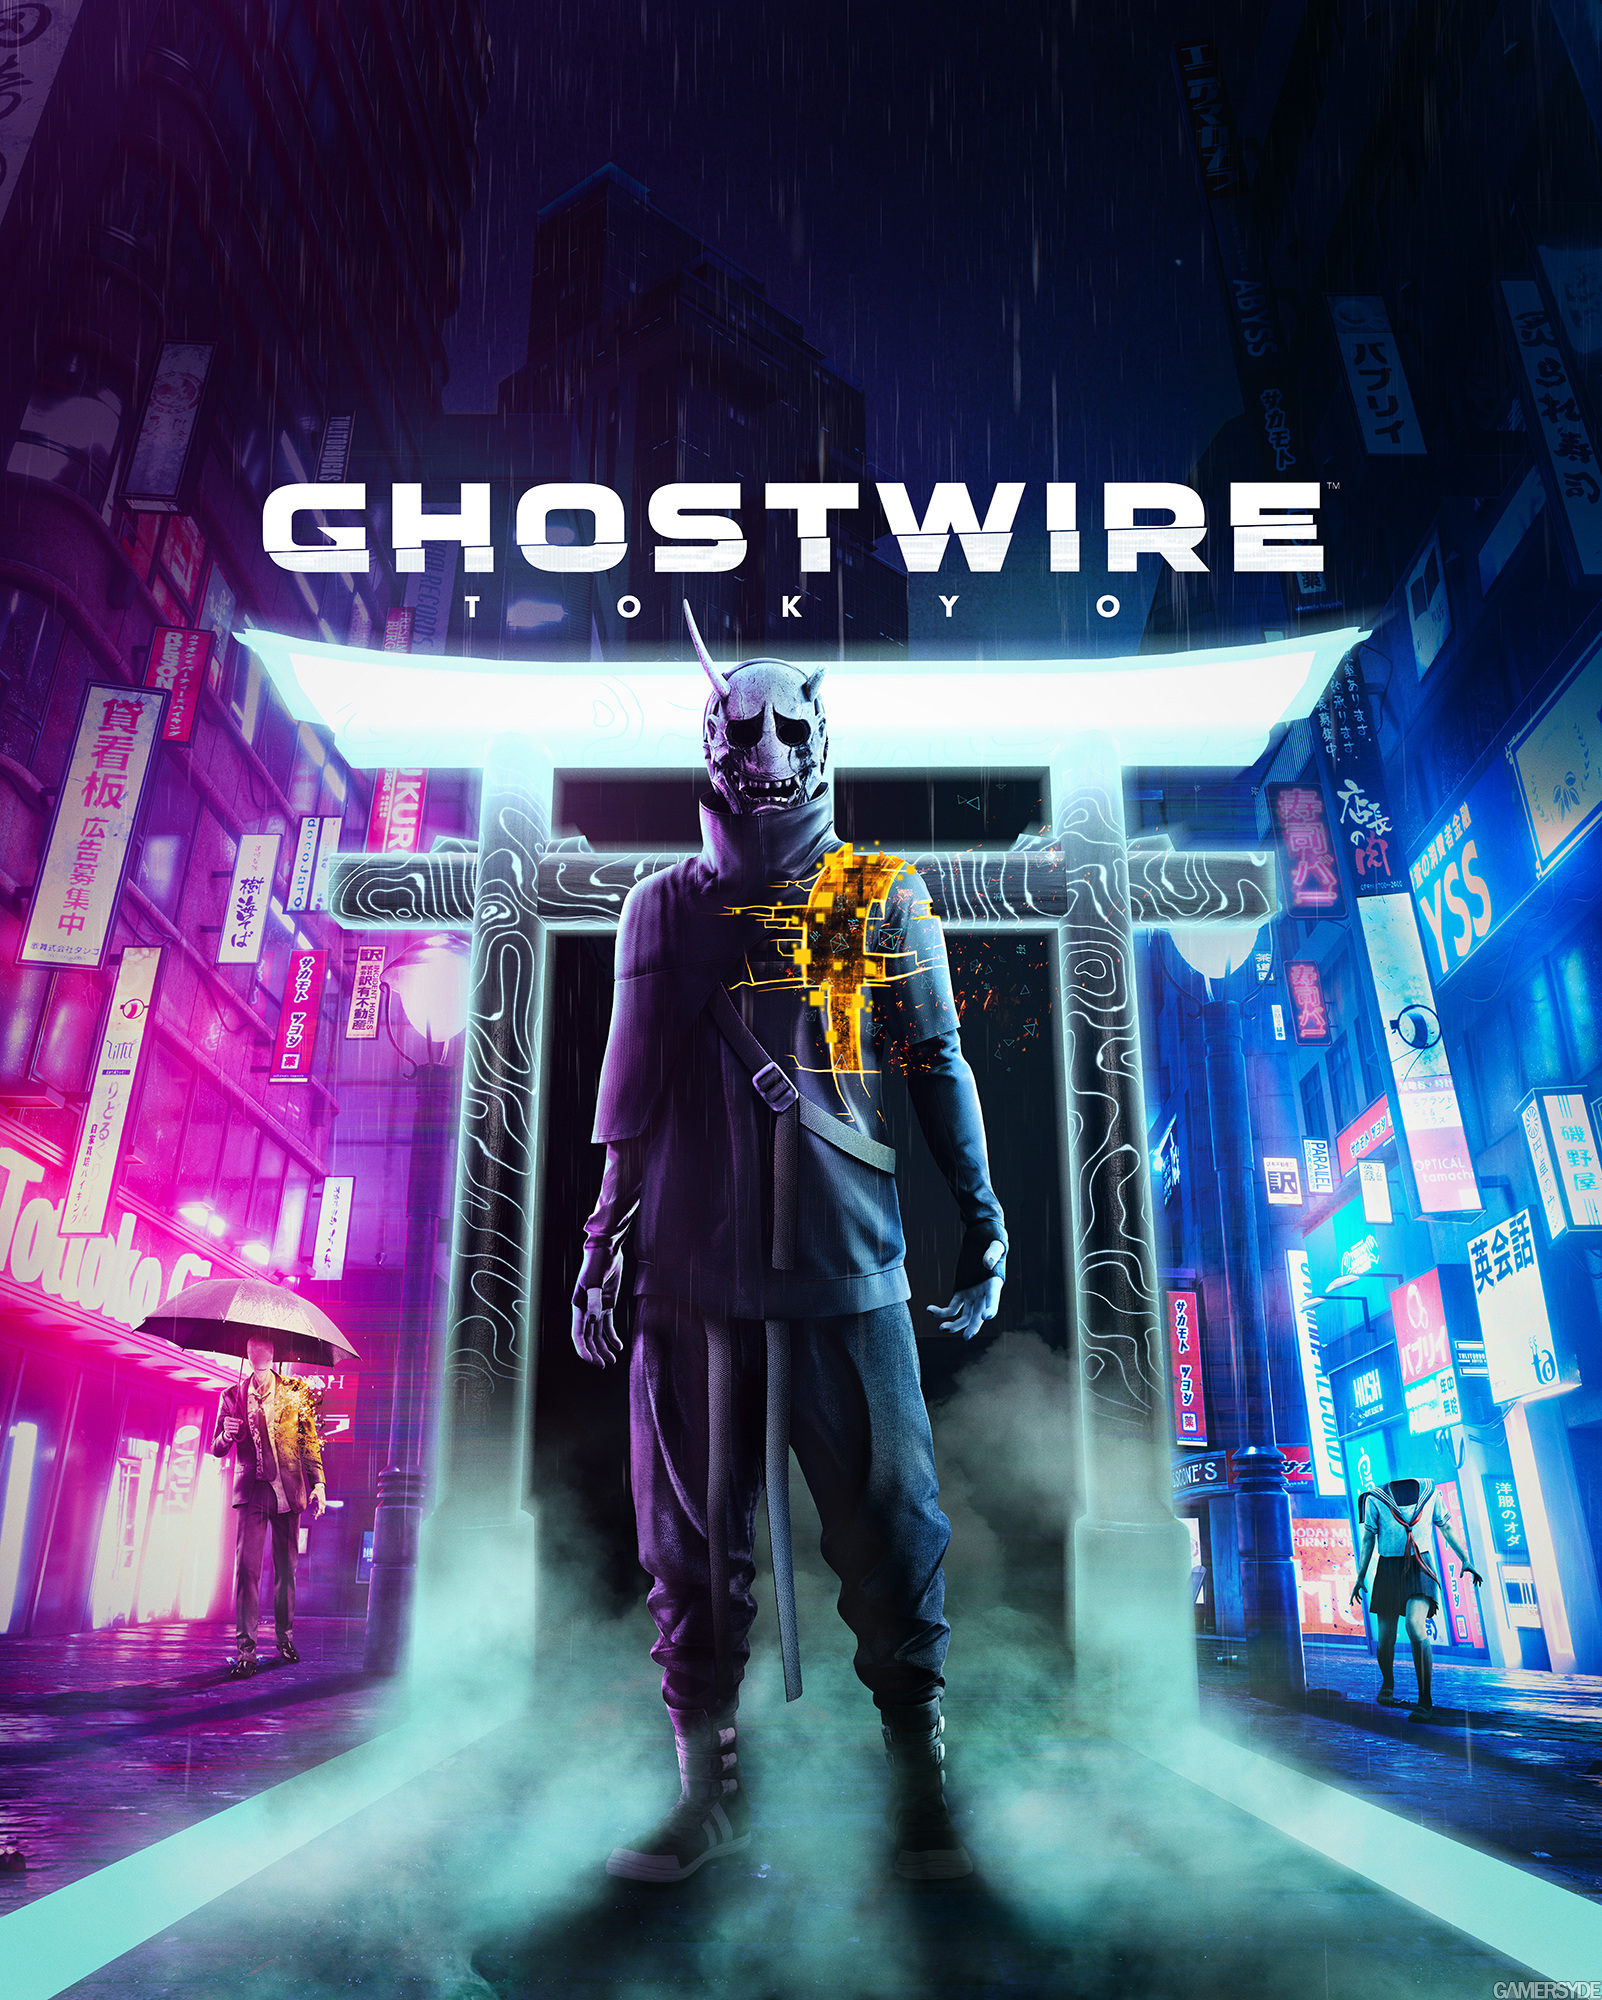 Cover-Art-Ghostwire-Tokyo.jpg